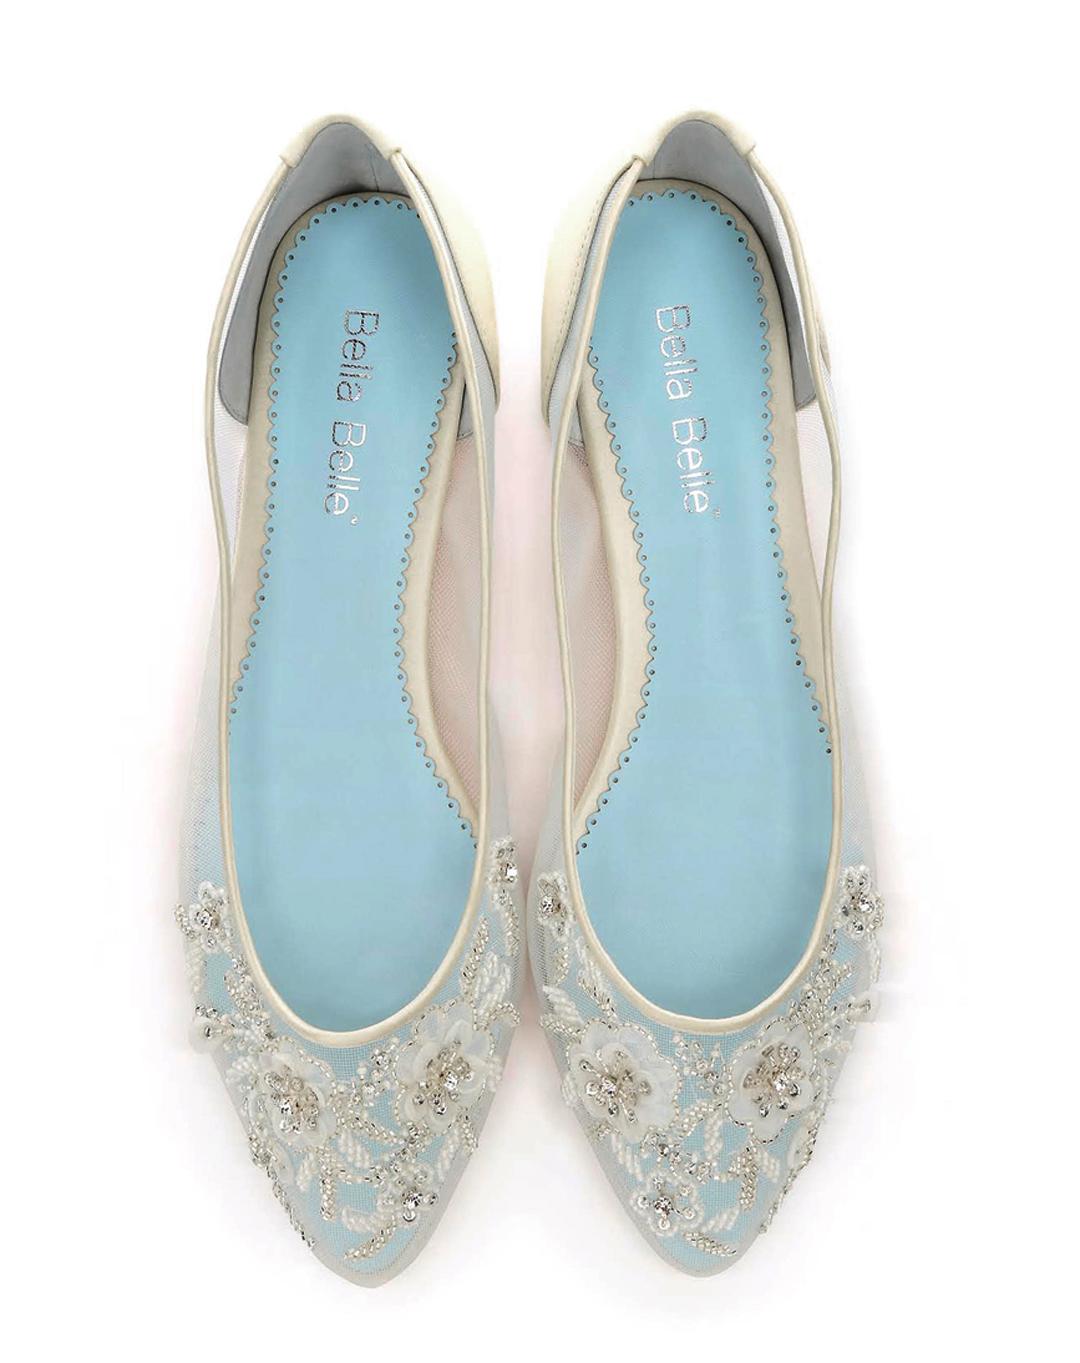 e80f2cbf0 BELLA BELLE ADORA IVORY SILK FLAT - Dyeable Shoe Store